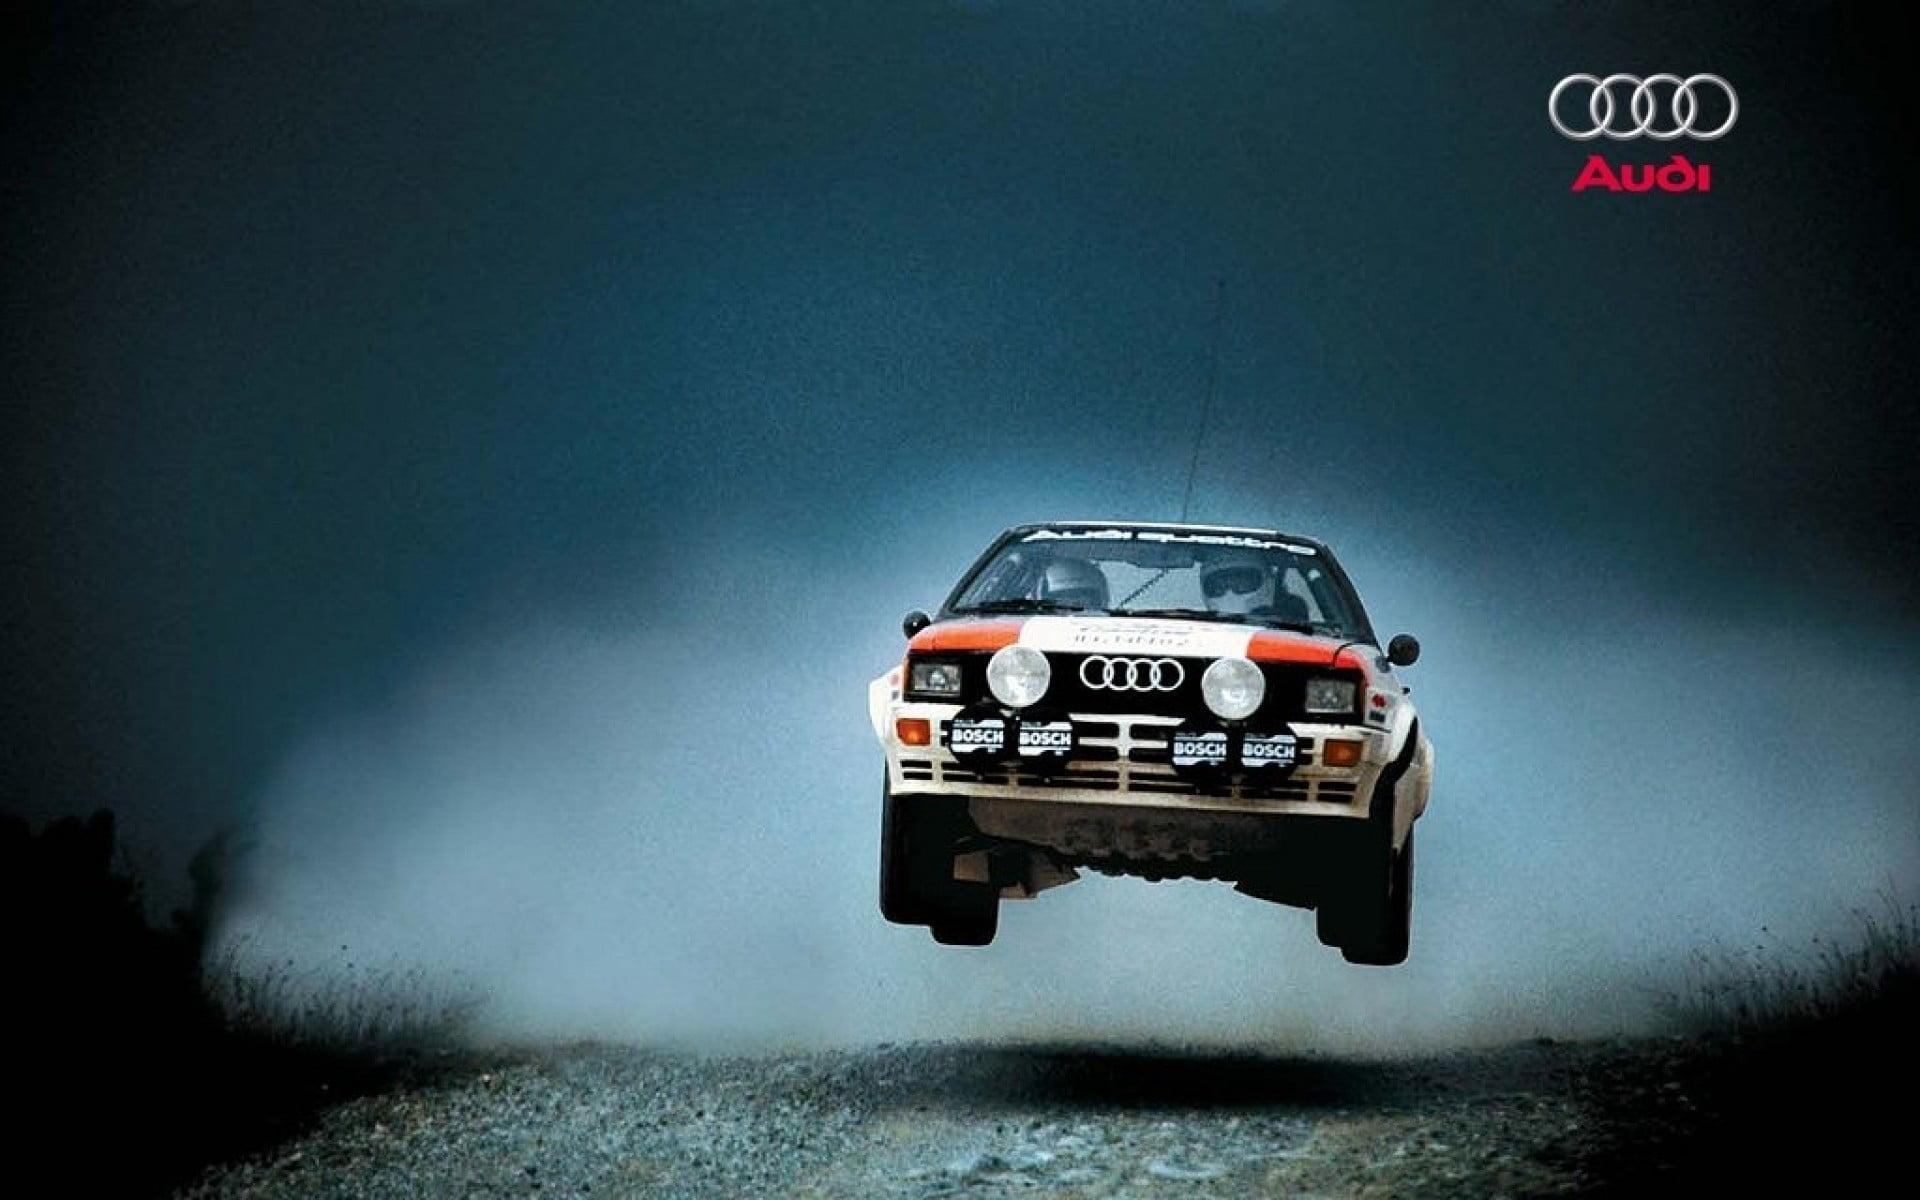 White and orange Audi car audi quattro car rally cars sports 1920x1200